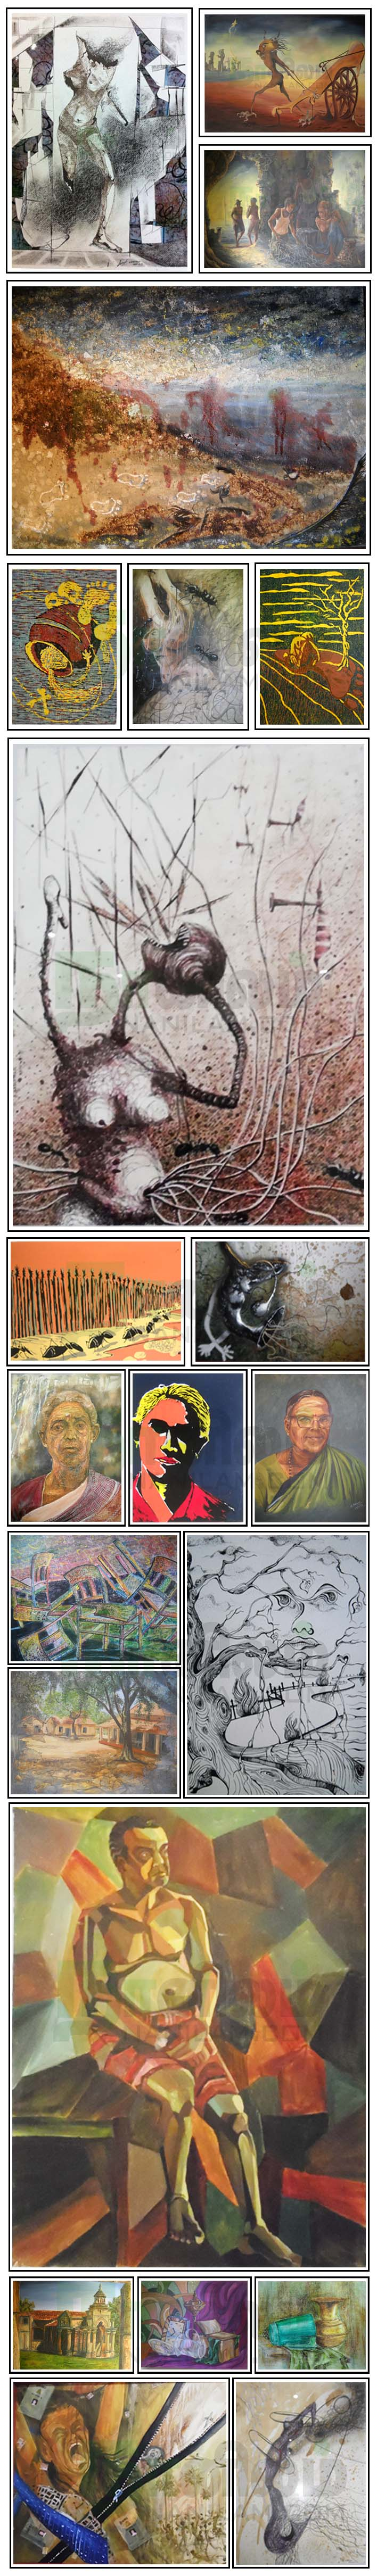 sarmala santhirathasan art exhibition in jaffna nanilam